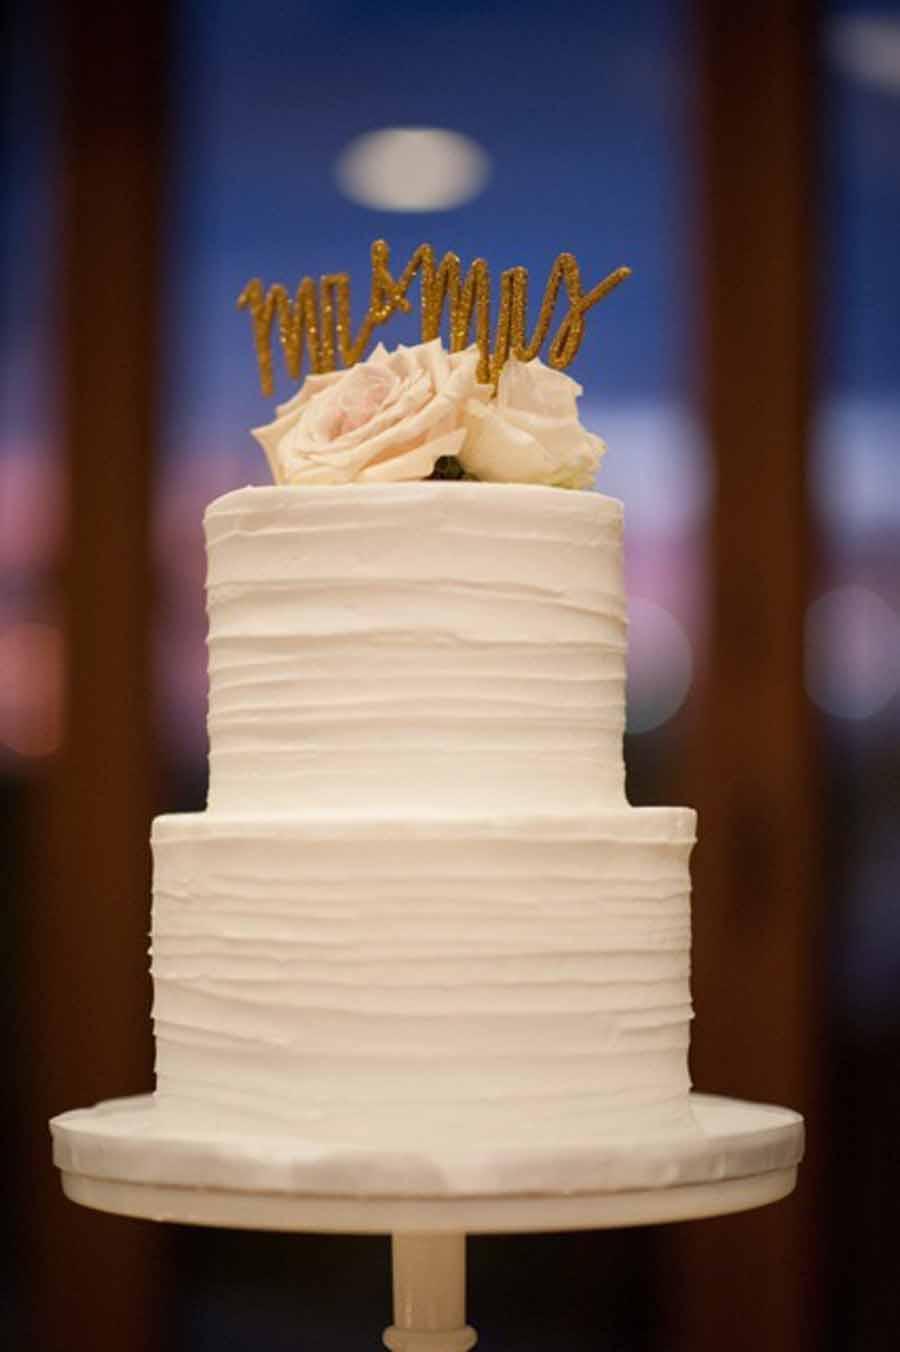 Wedding A Cake Life